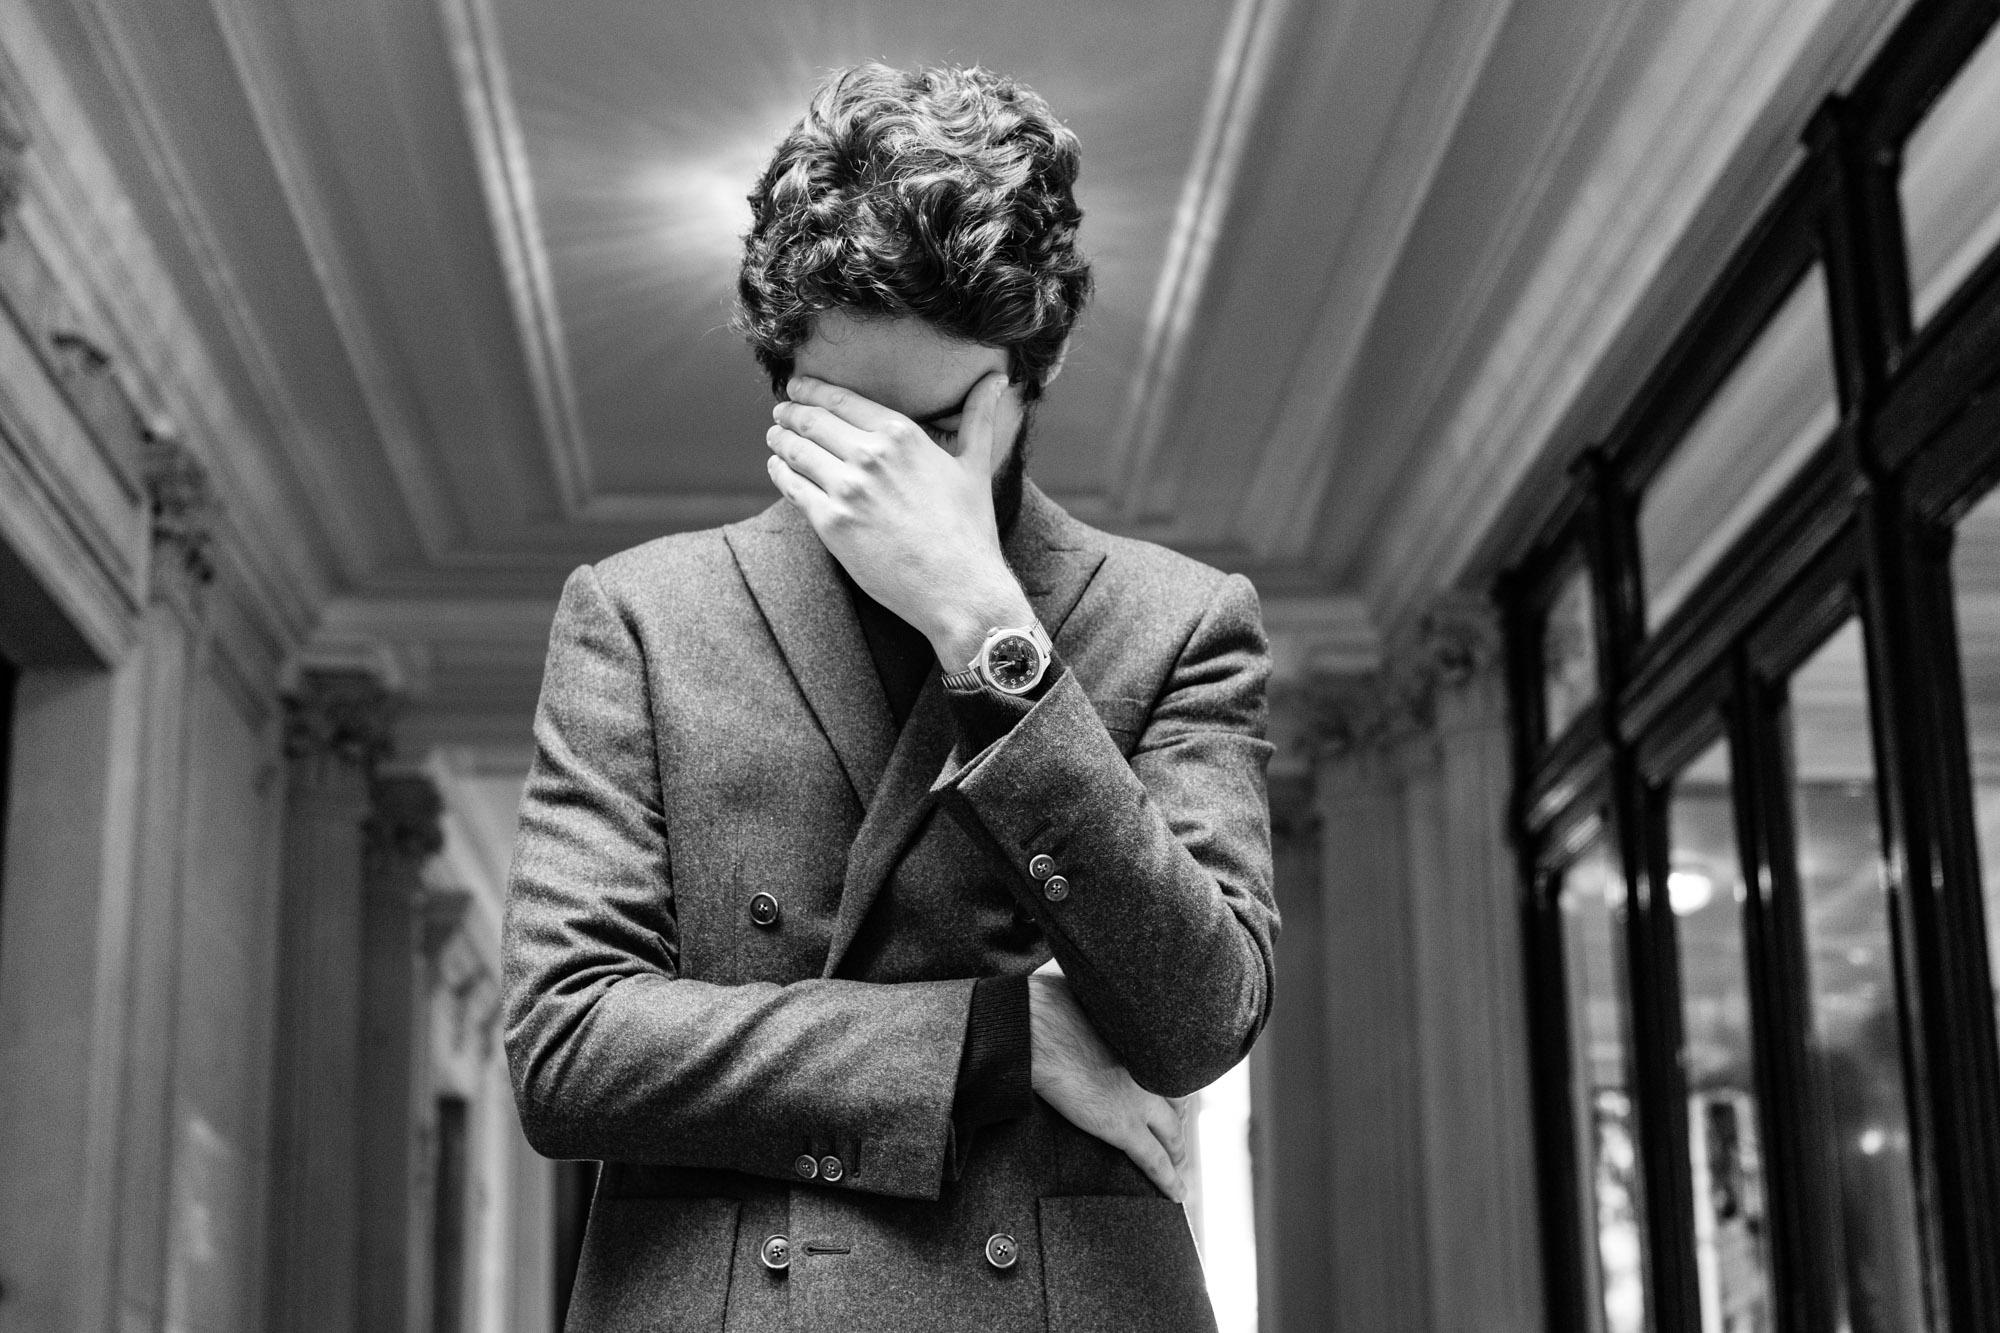 Horlogerie et frustration